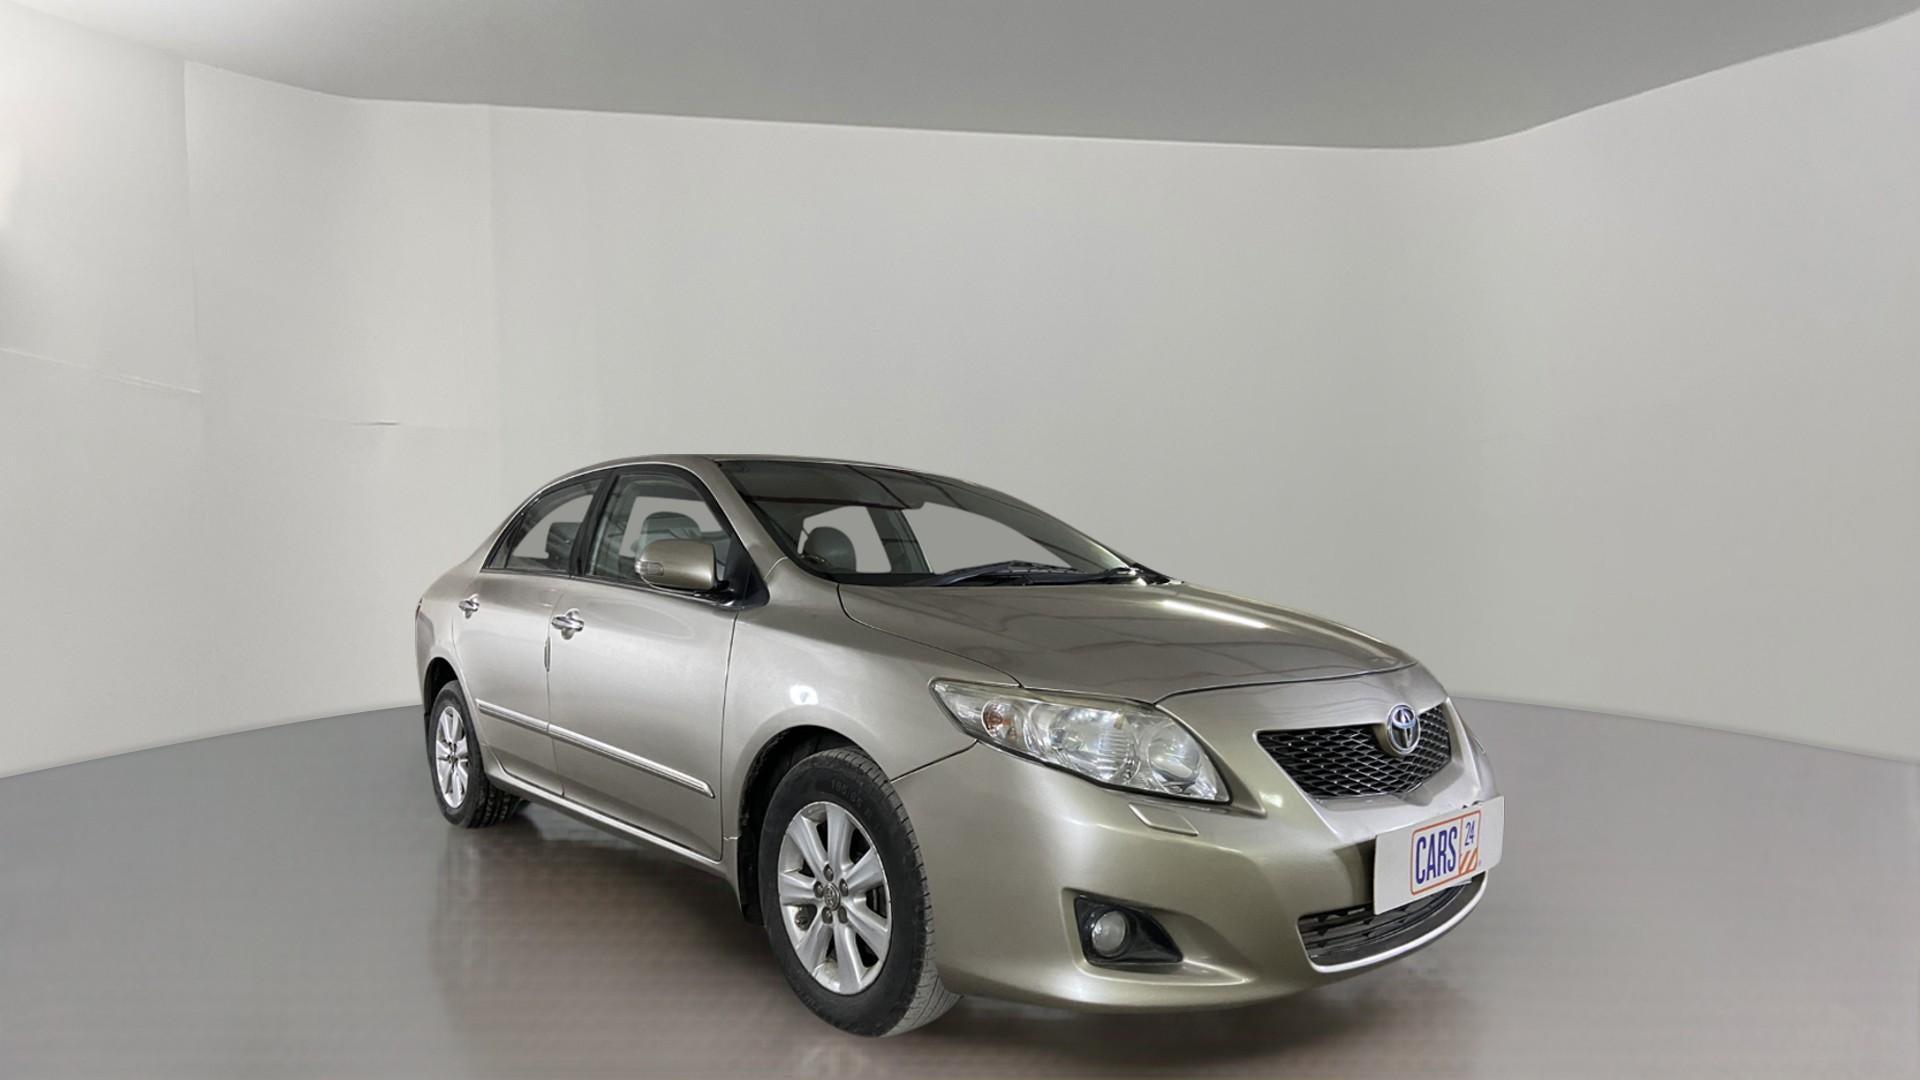 2010 Toyota Corolla Altis D 4D GL